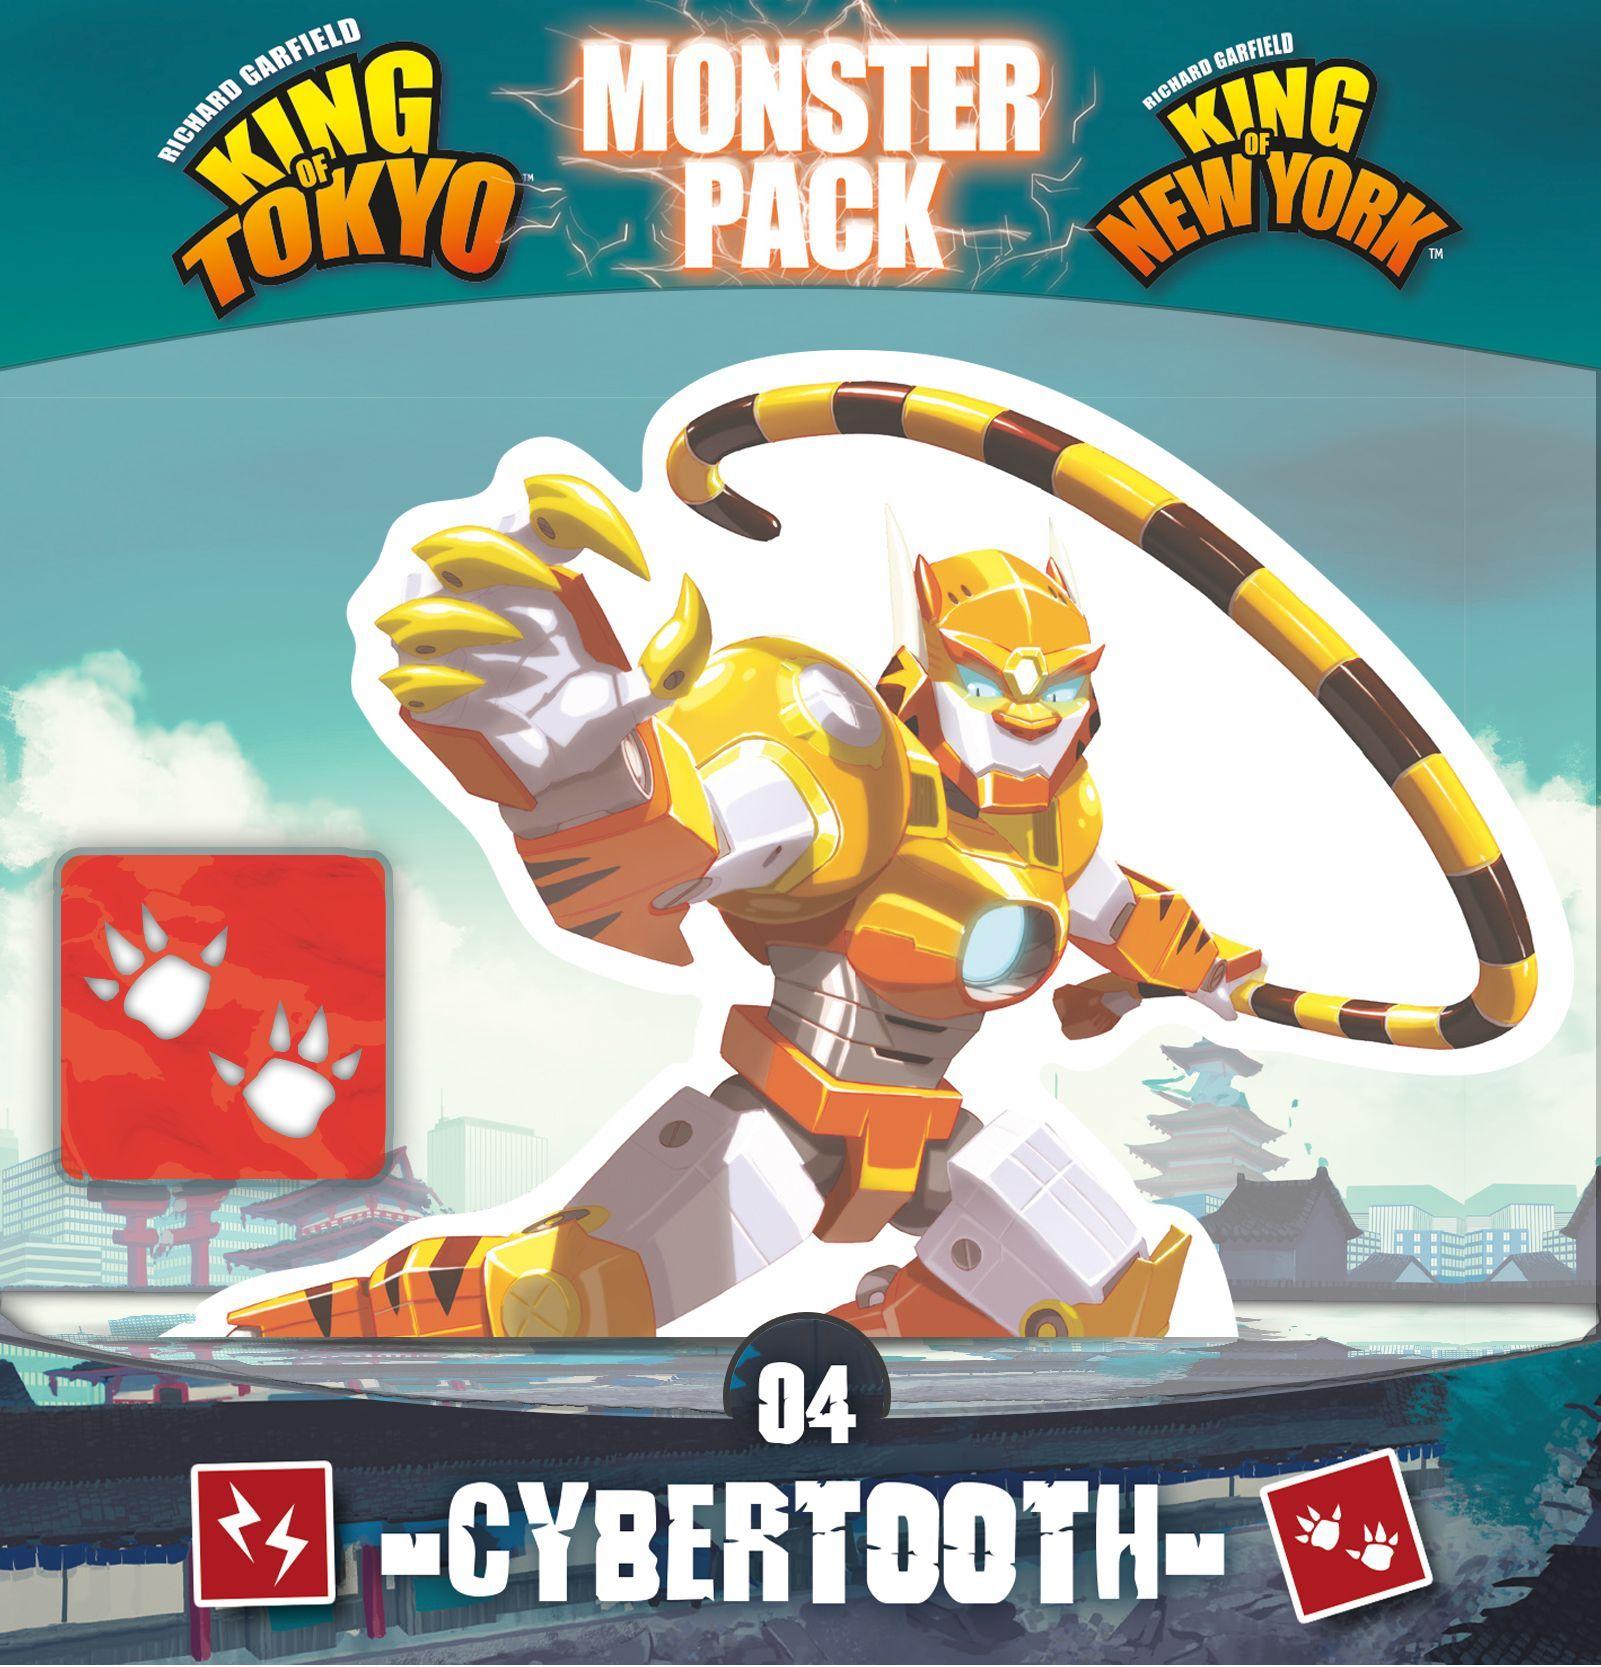 King of Tokyo - Monster Pack : Cybertooth